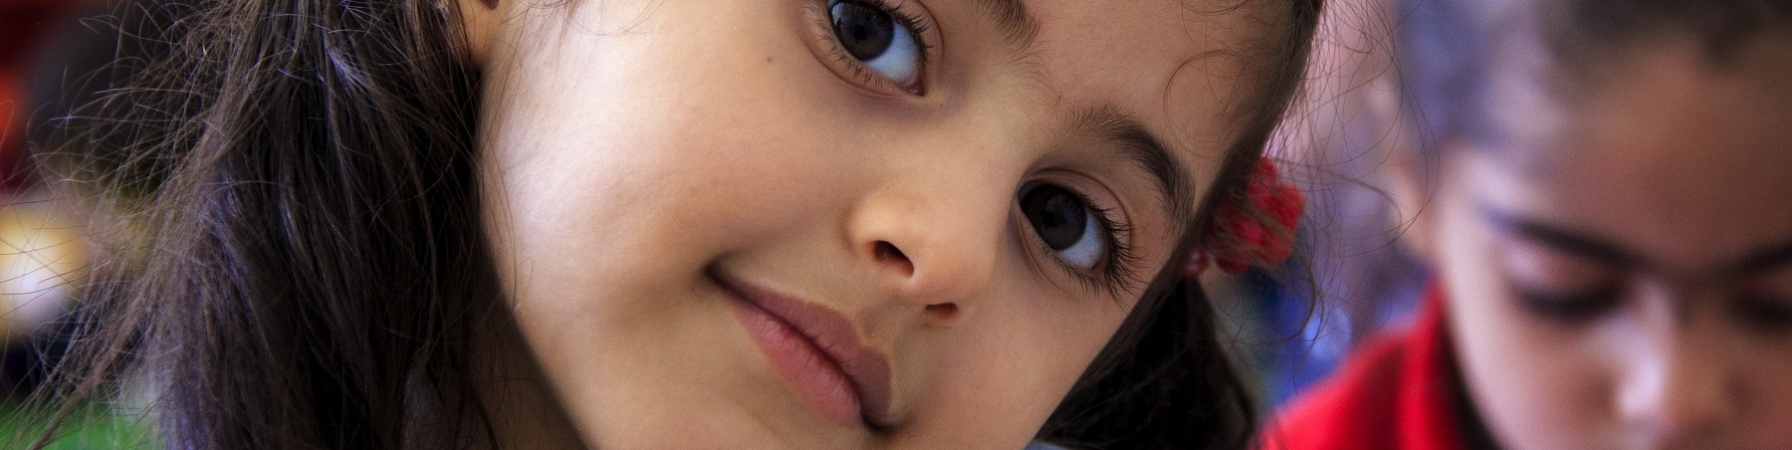 Primo piano bambina mora testa inclinata